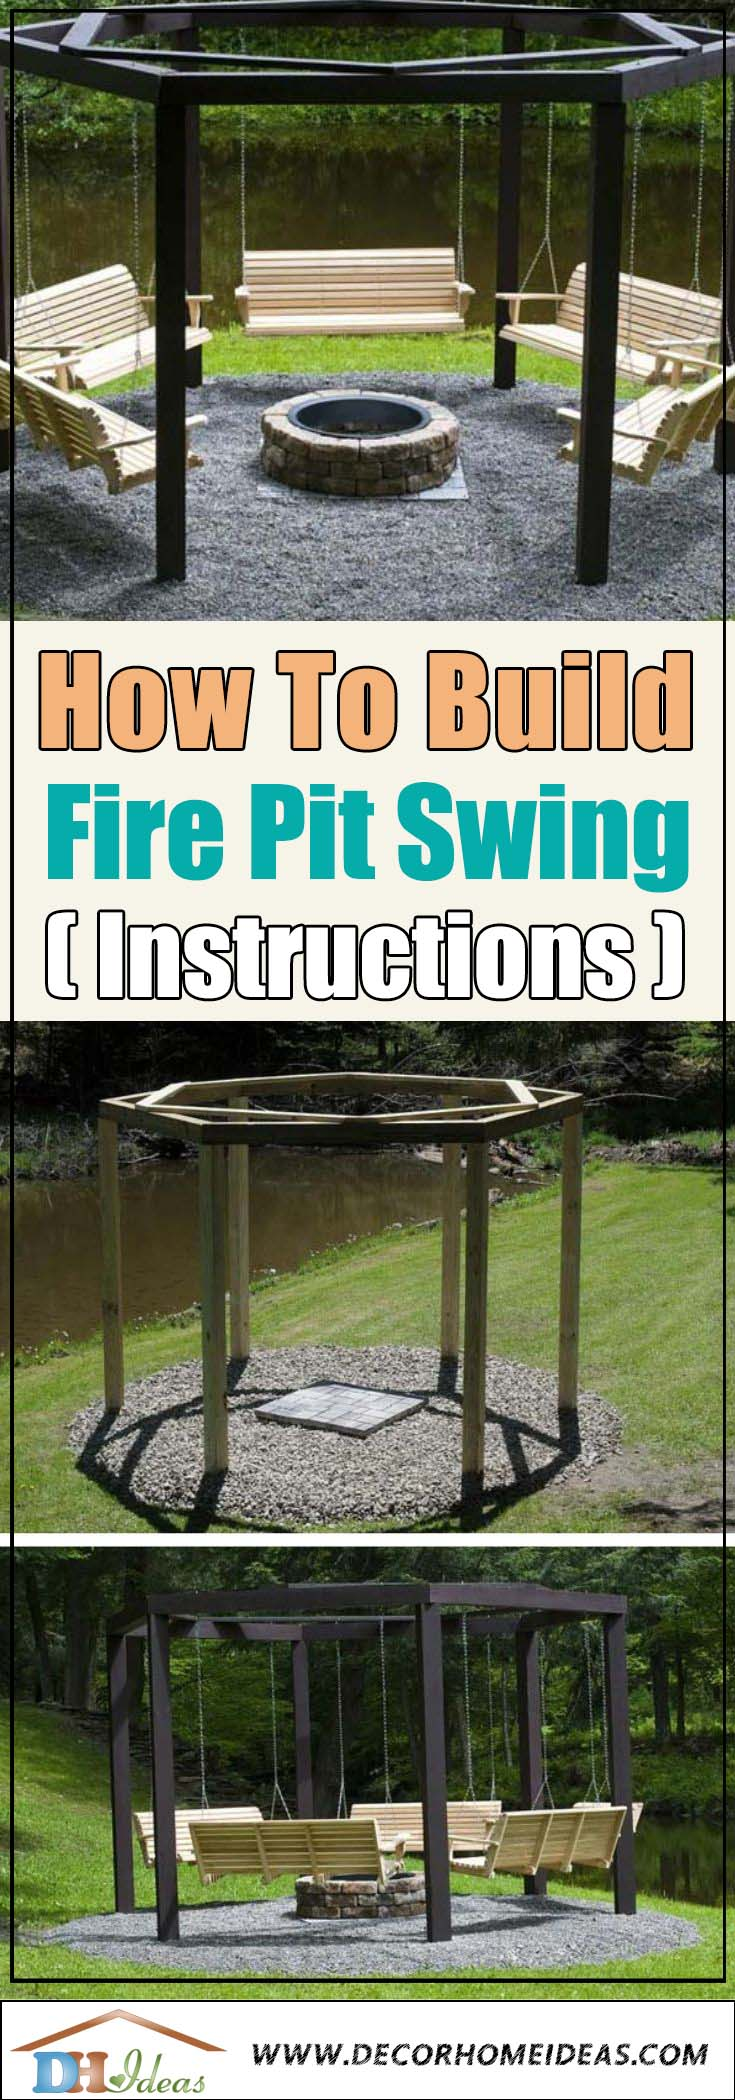 How To Build Fire Pit Swing #firepit #diy #decorhomeideas